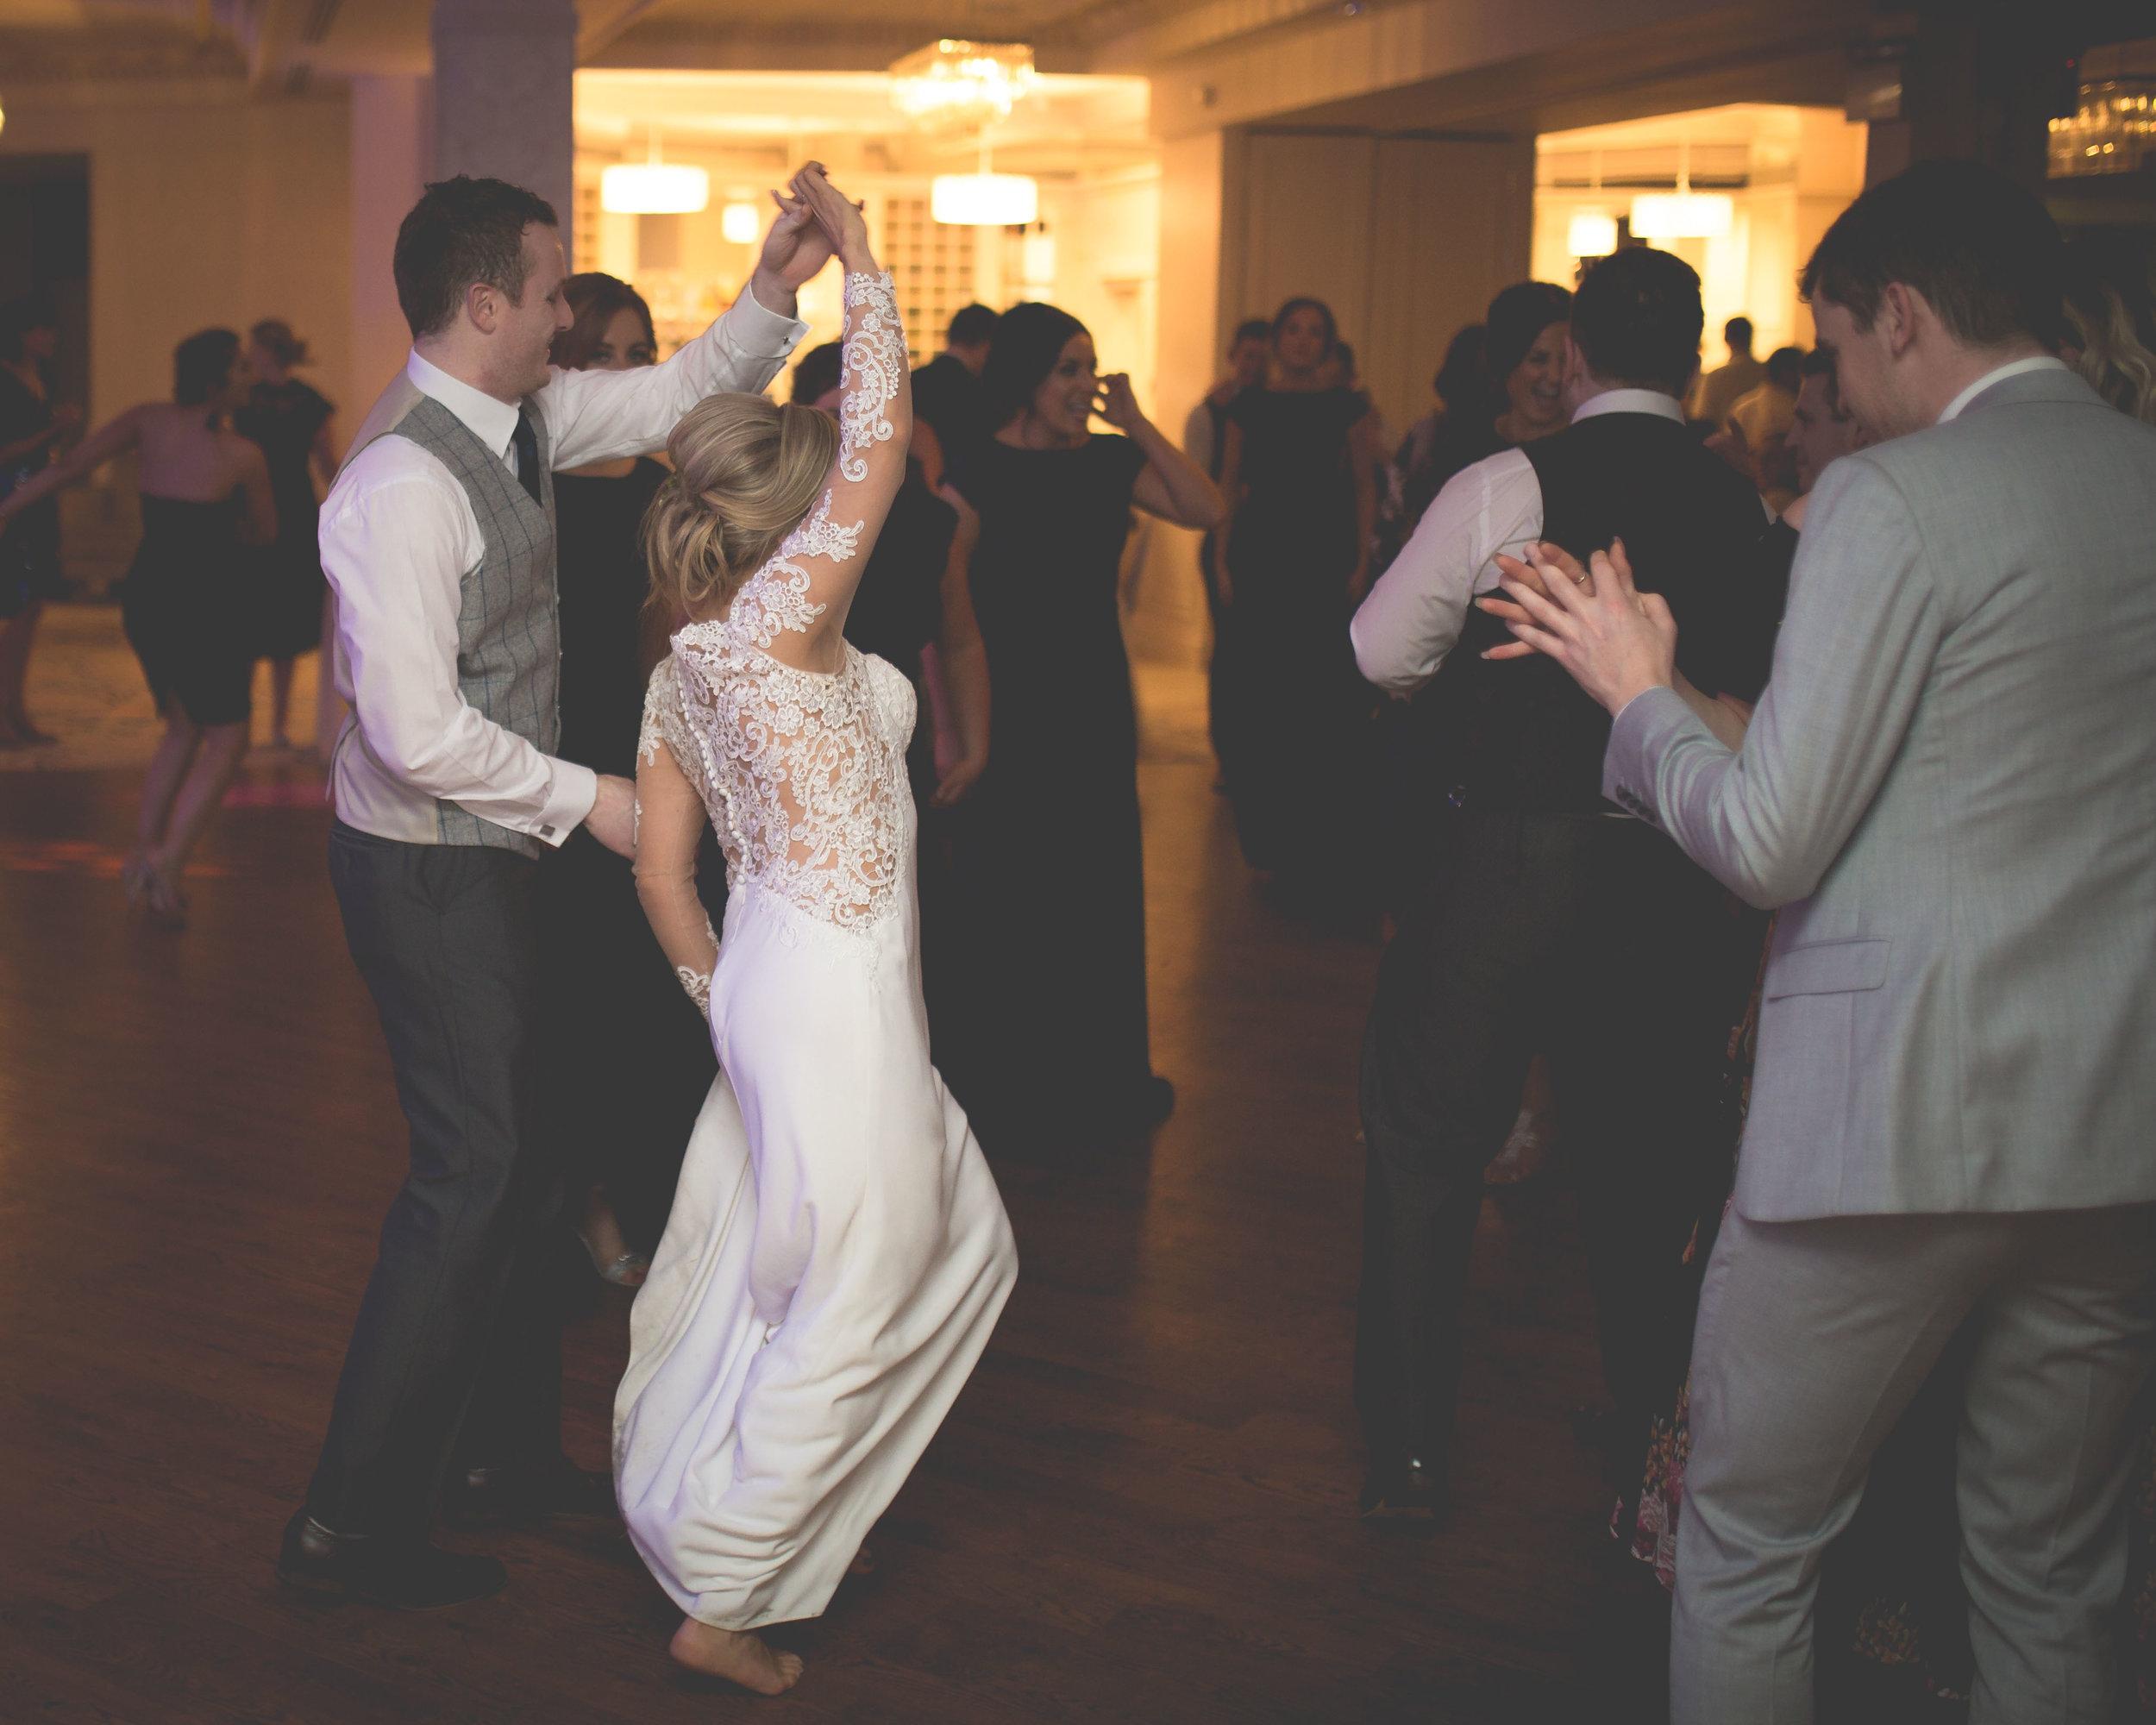 MaryJo_Conor_Mageean_Dancing-7.jpg